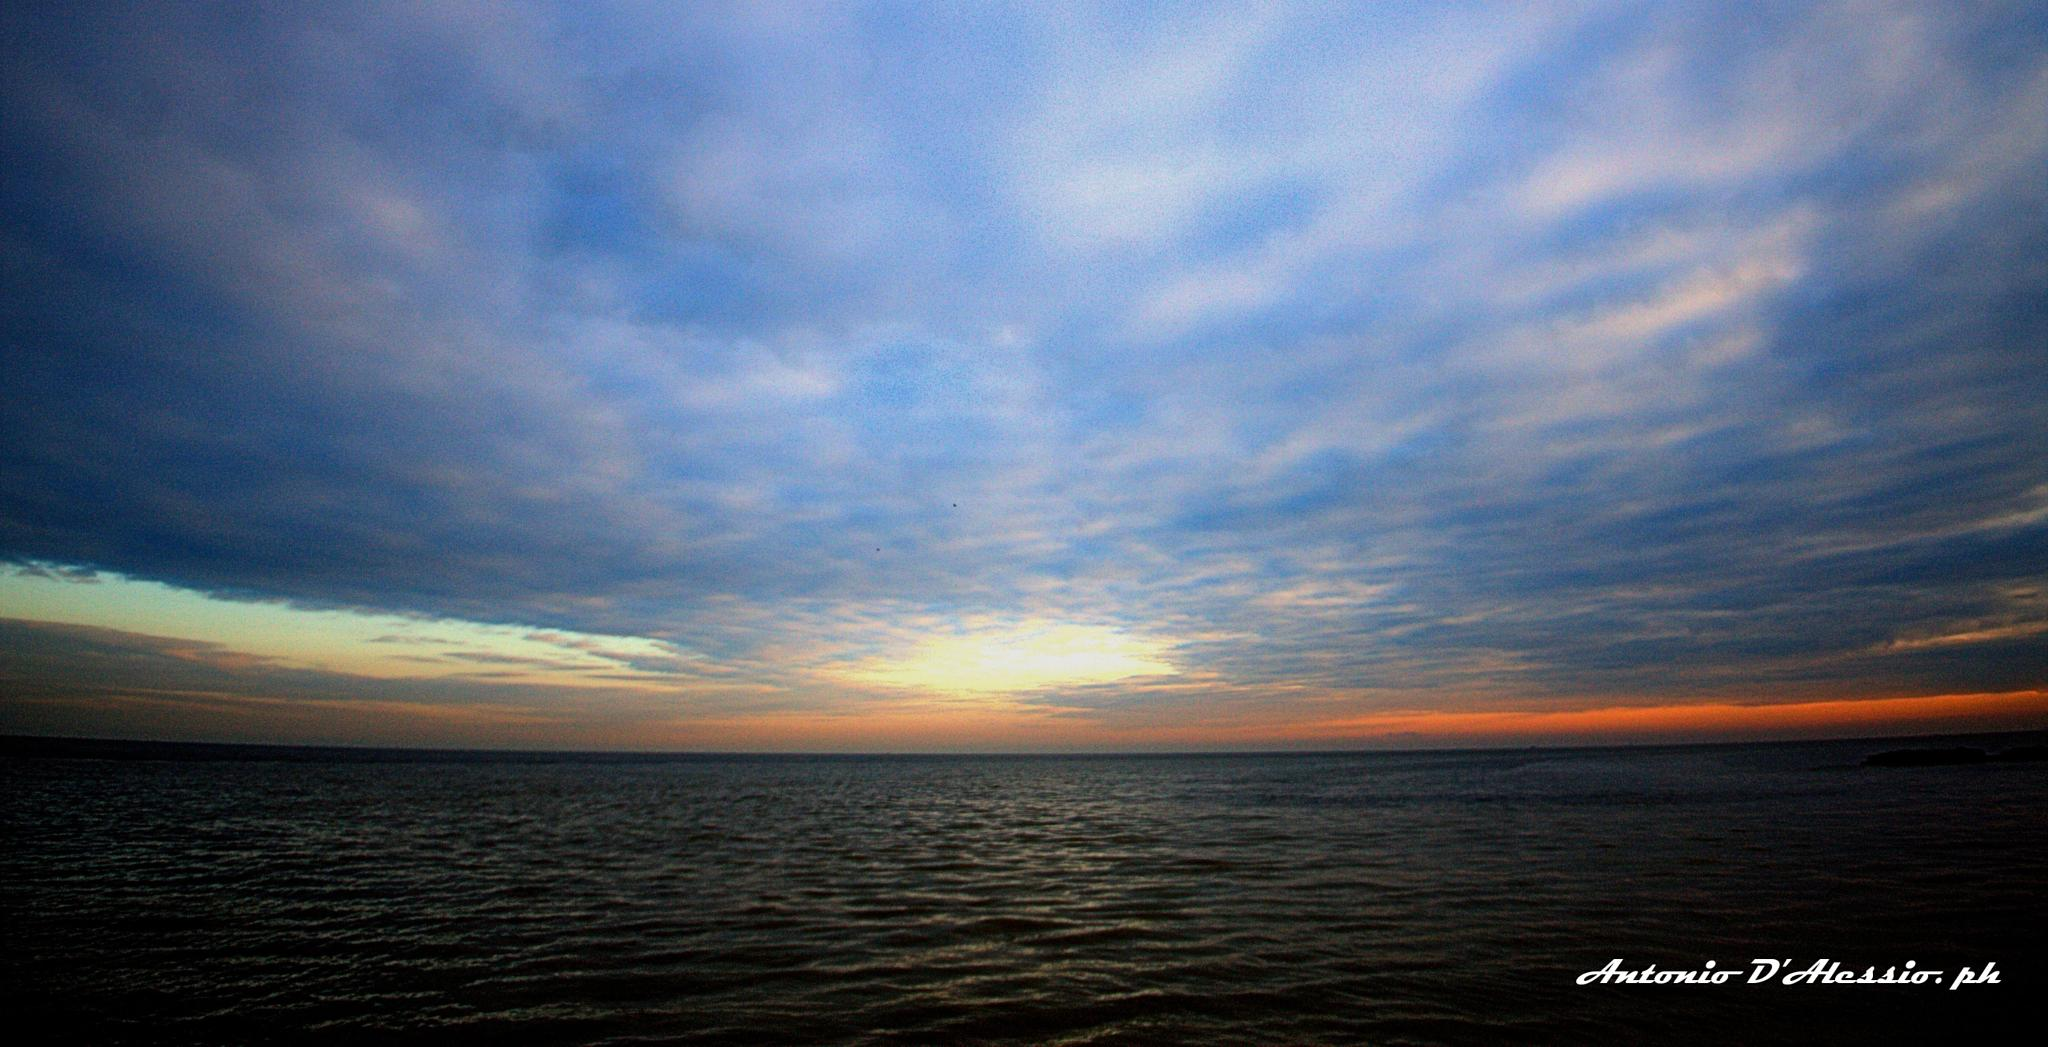 Our sea takes your breath away Adriatic sea by Antonio.DAlessio